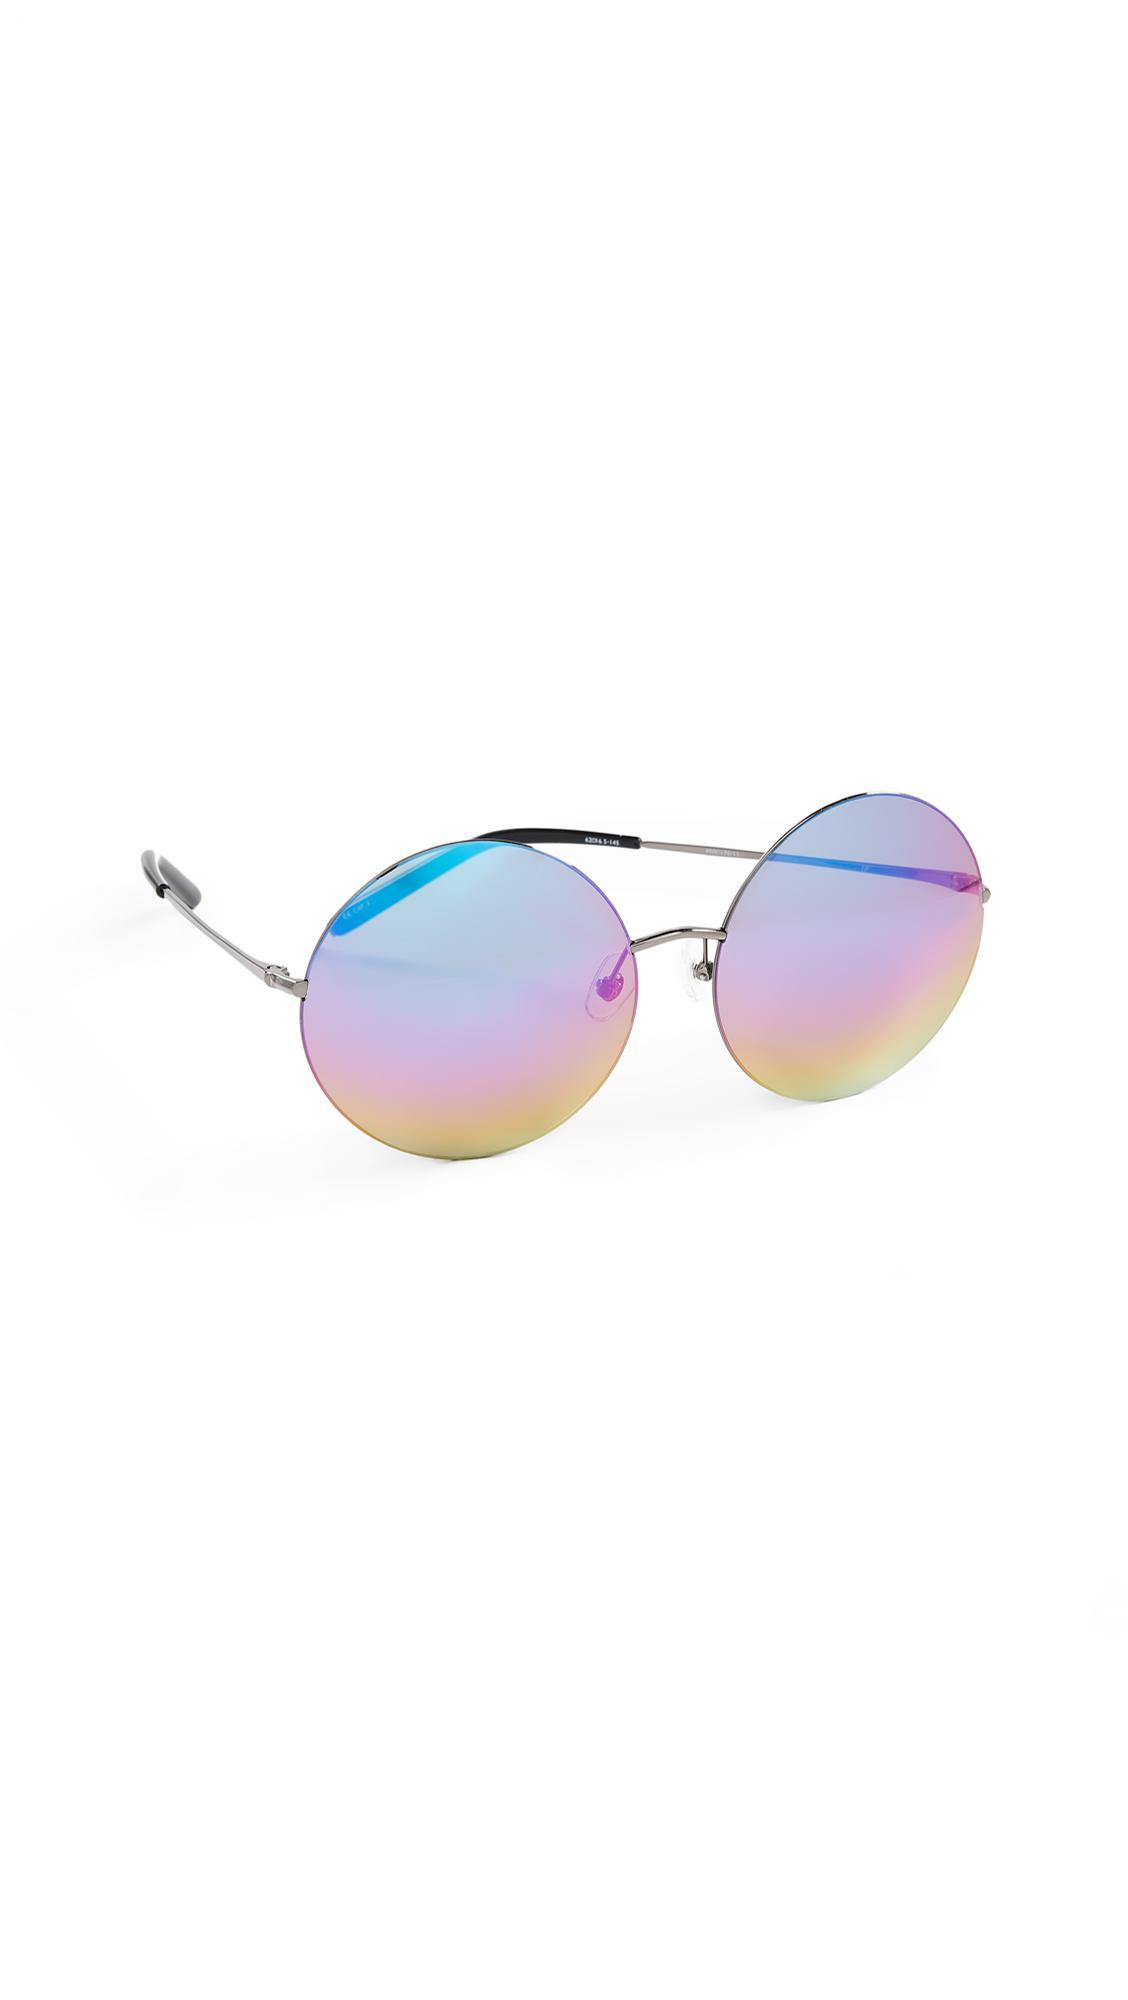 b9a52477ea87 ... Matthew Williamson X Linda Farrow Oversized Round Sunglasses - Lyst.  View fullscreen